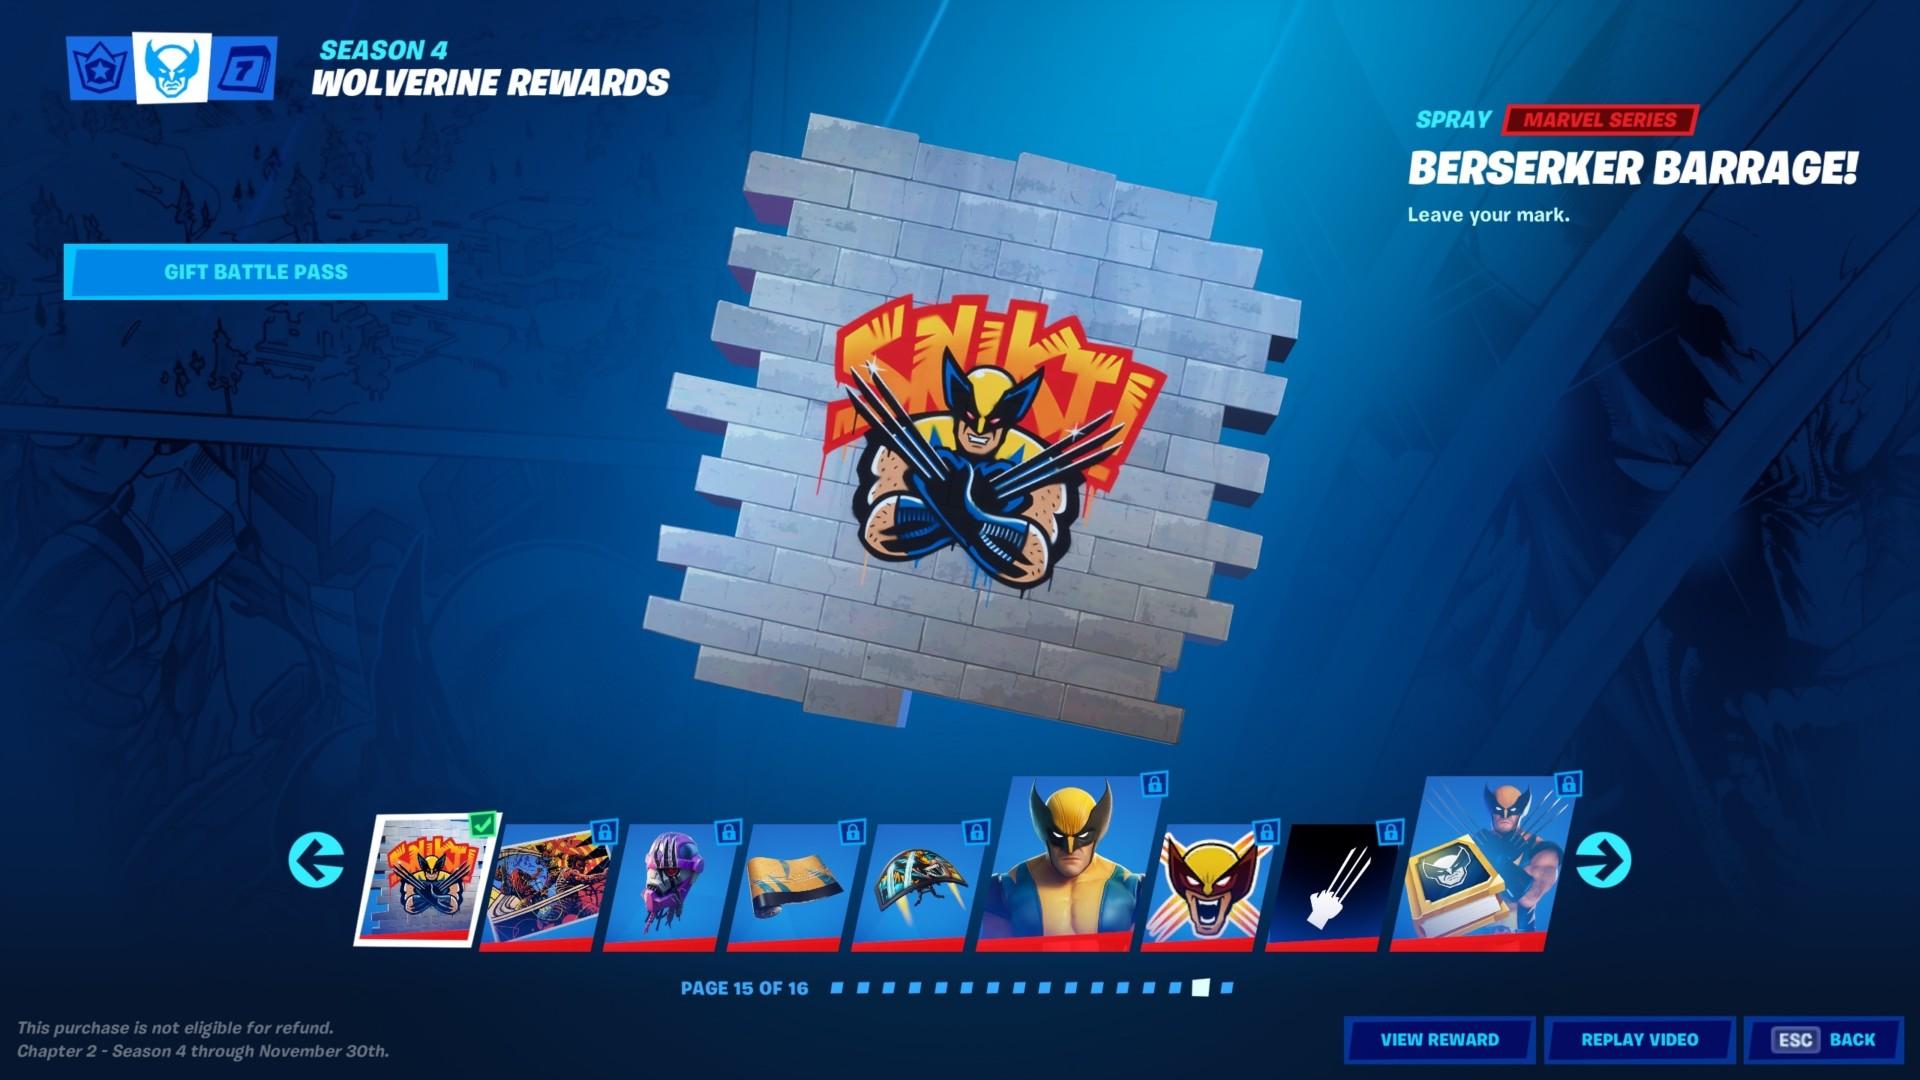 All Fortnite Wolverine Claw Marks Locations In Fortnite Season 4